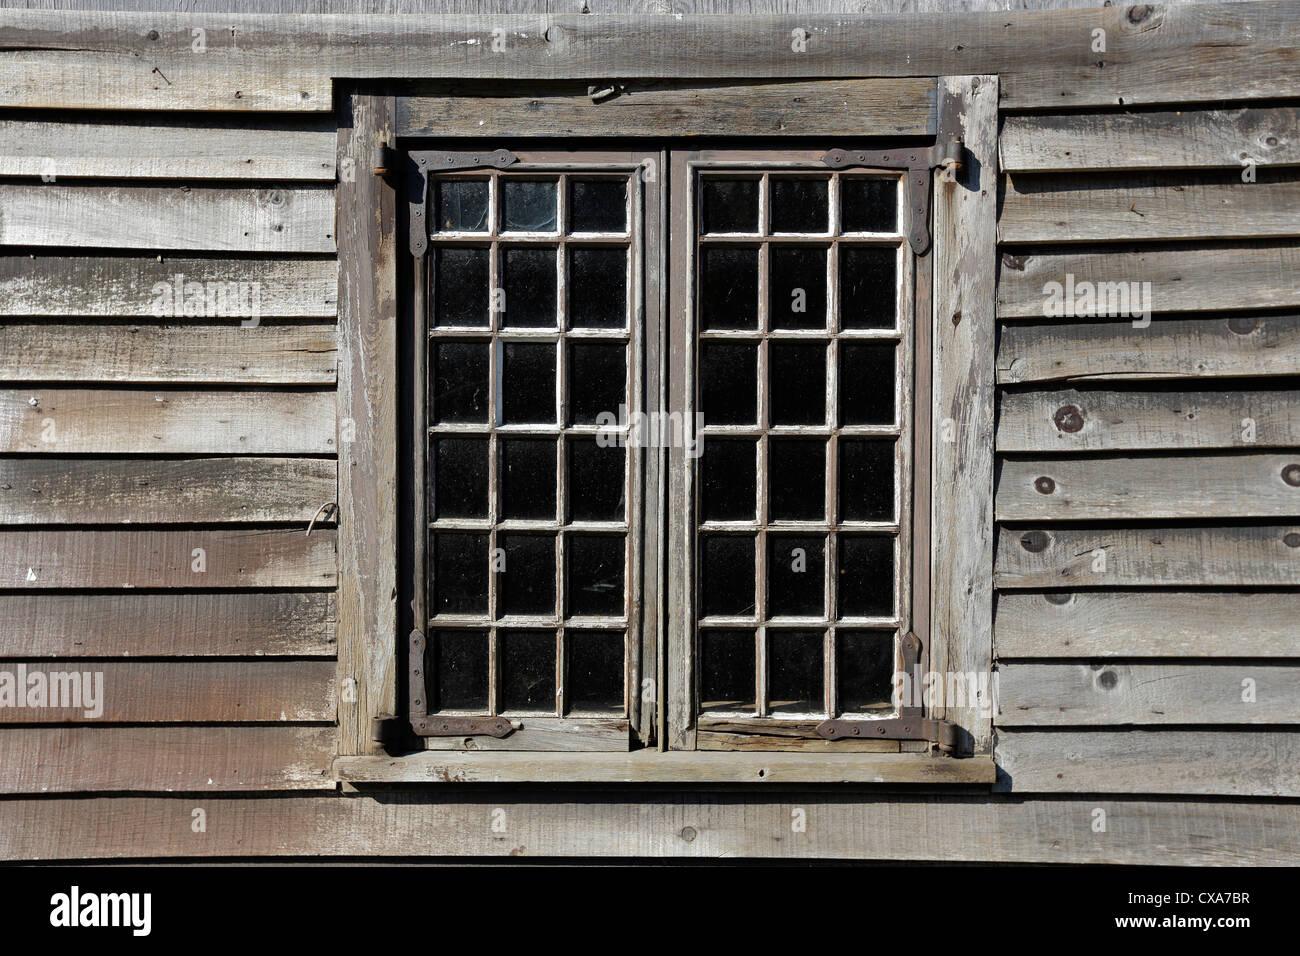 weathered clapboard siding window frame, Shelburne, Nova Scotia - Stock Image